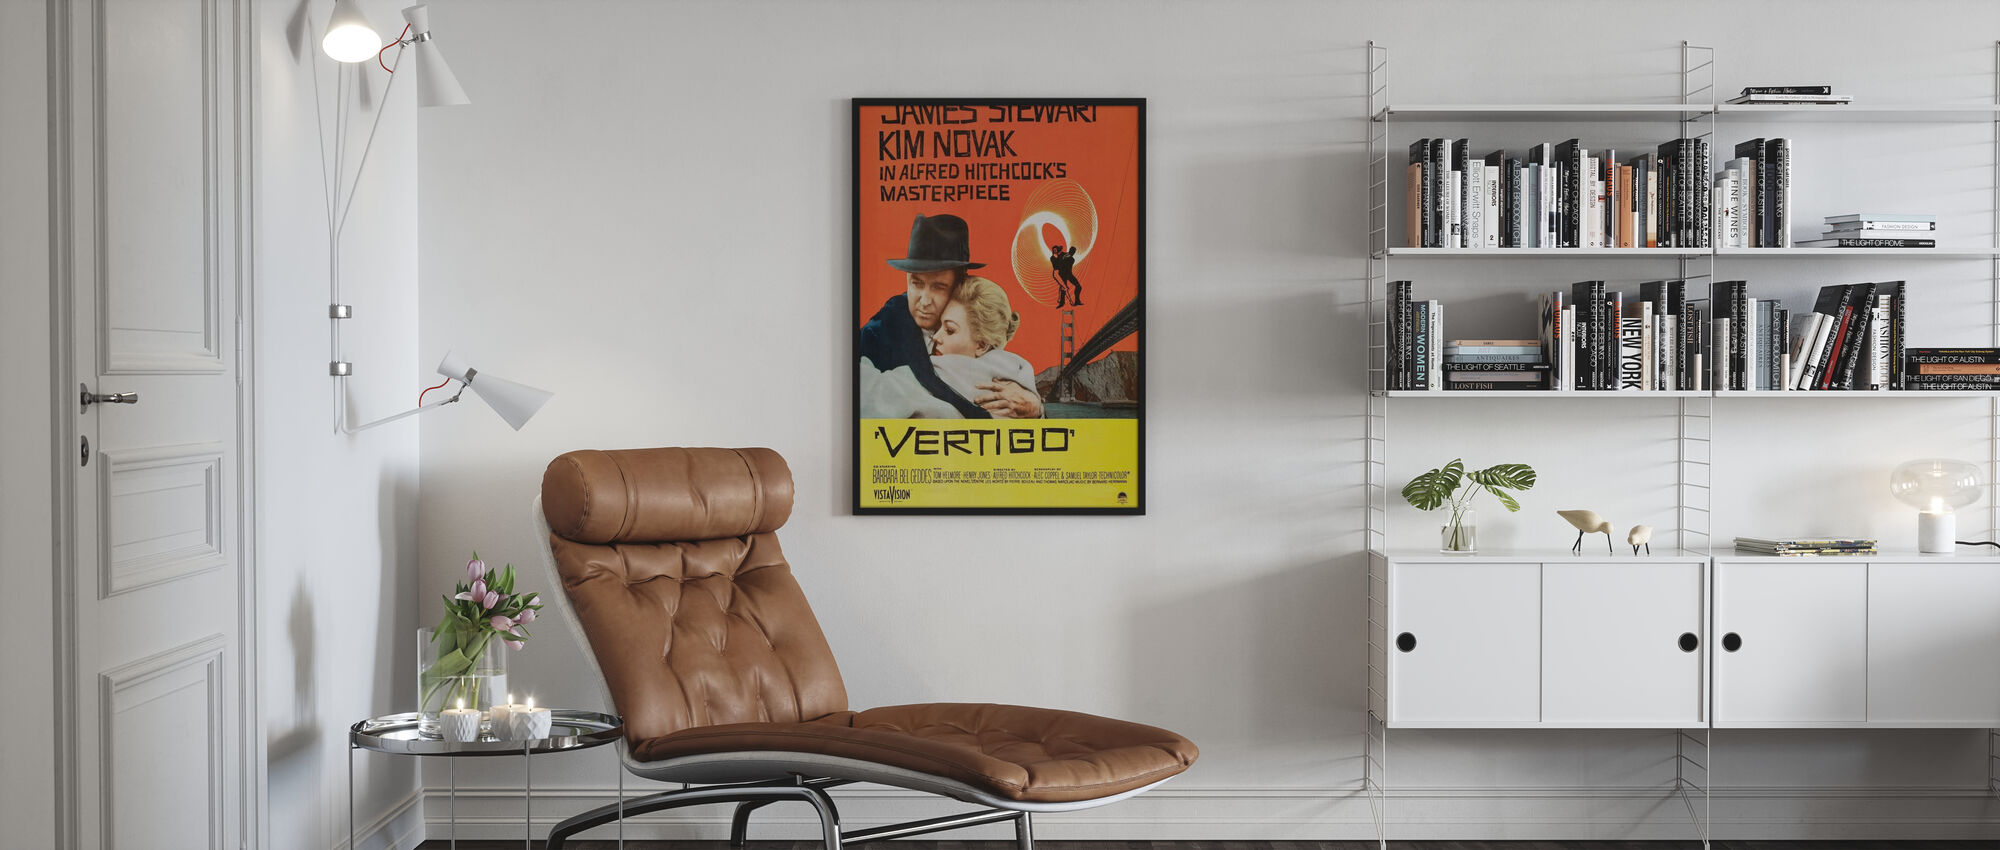 Vertigo - Inramad tavla - Vardagsrum